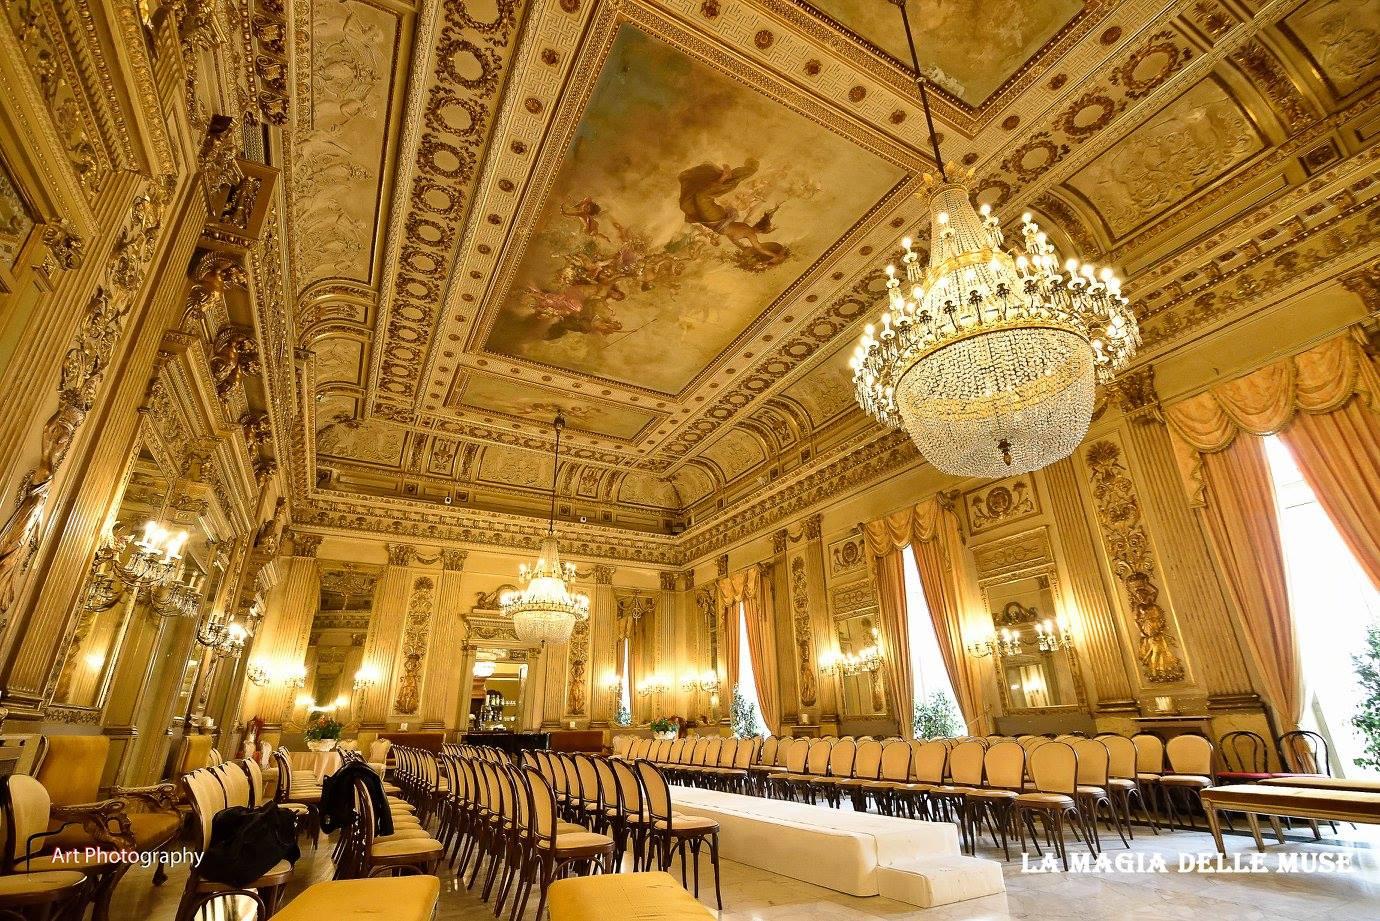 1. La Sala delle Muse